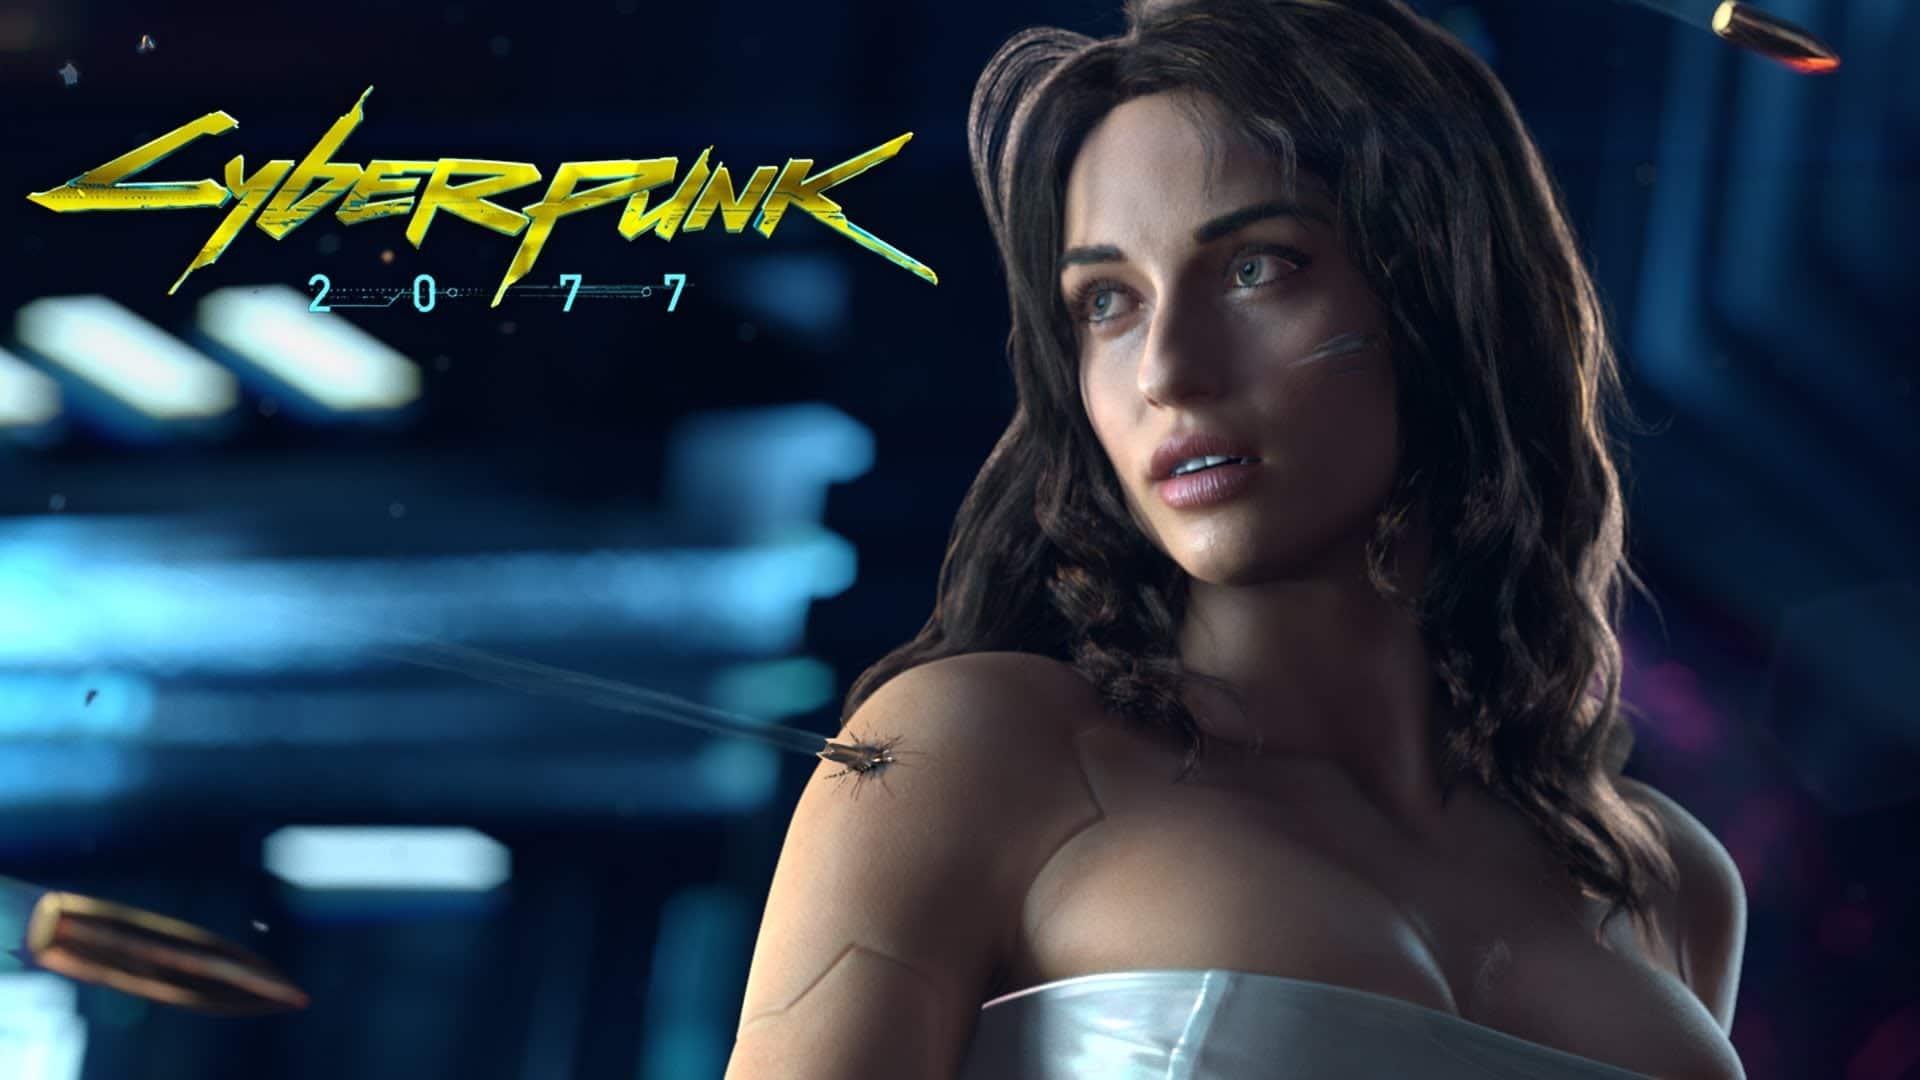 CD Projeckt Red defiende su marca registrada 'Cyberpunk'